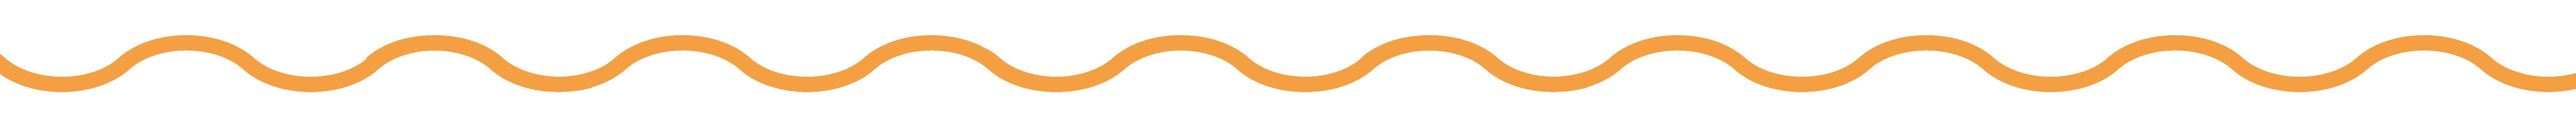 paths_orange